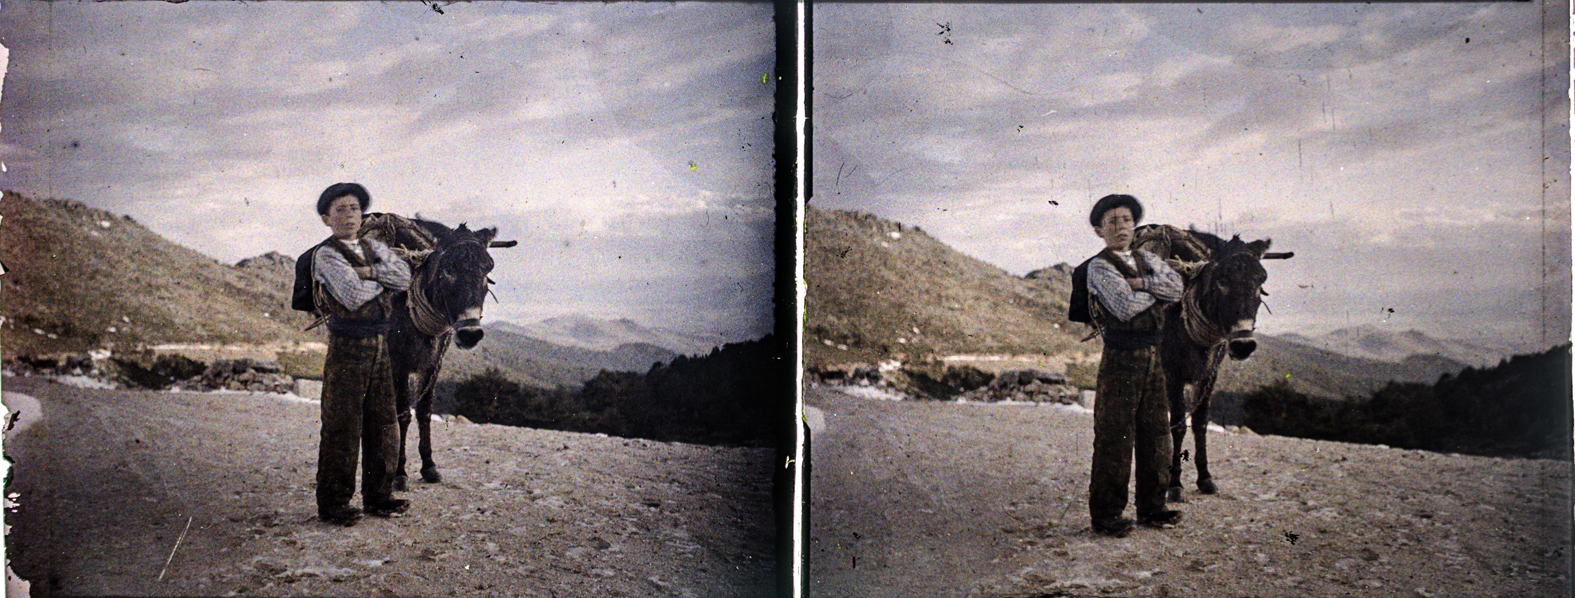 Zagal y burro. Carretera de Navacerrada, 1910. © Herederos F. Avial.